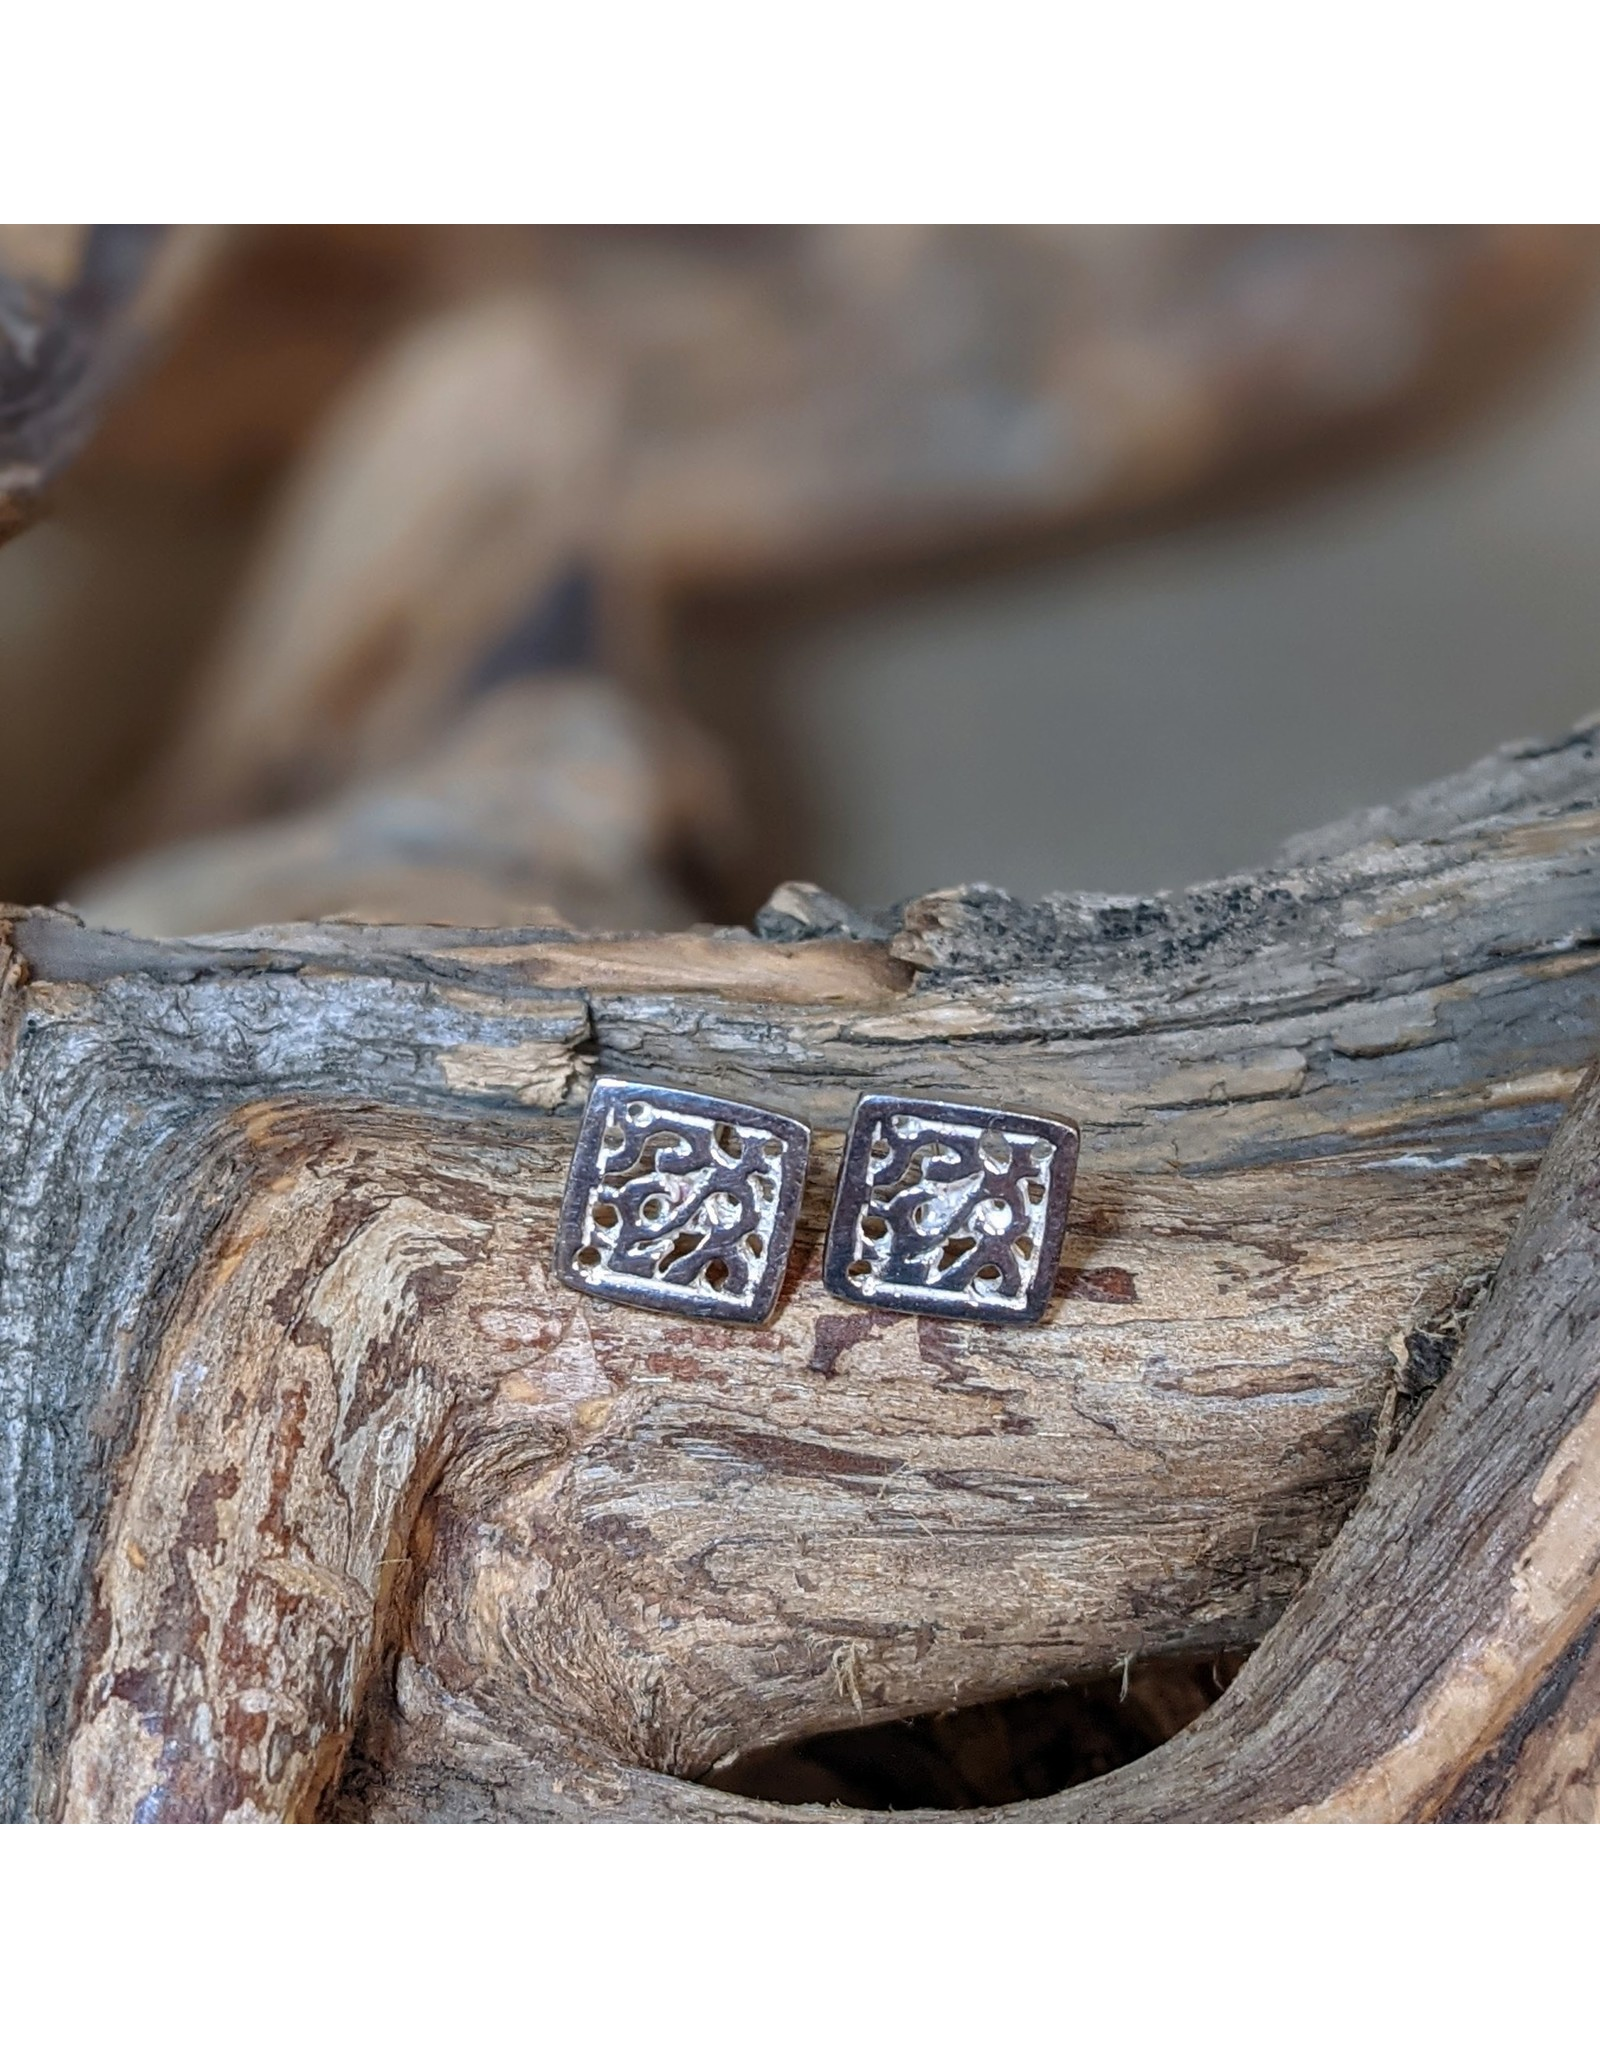 Ten Thousand Villages Square Filigree Stud Earrings